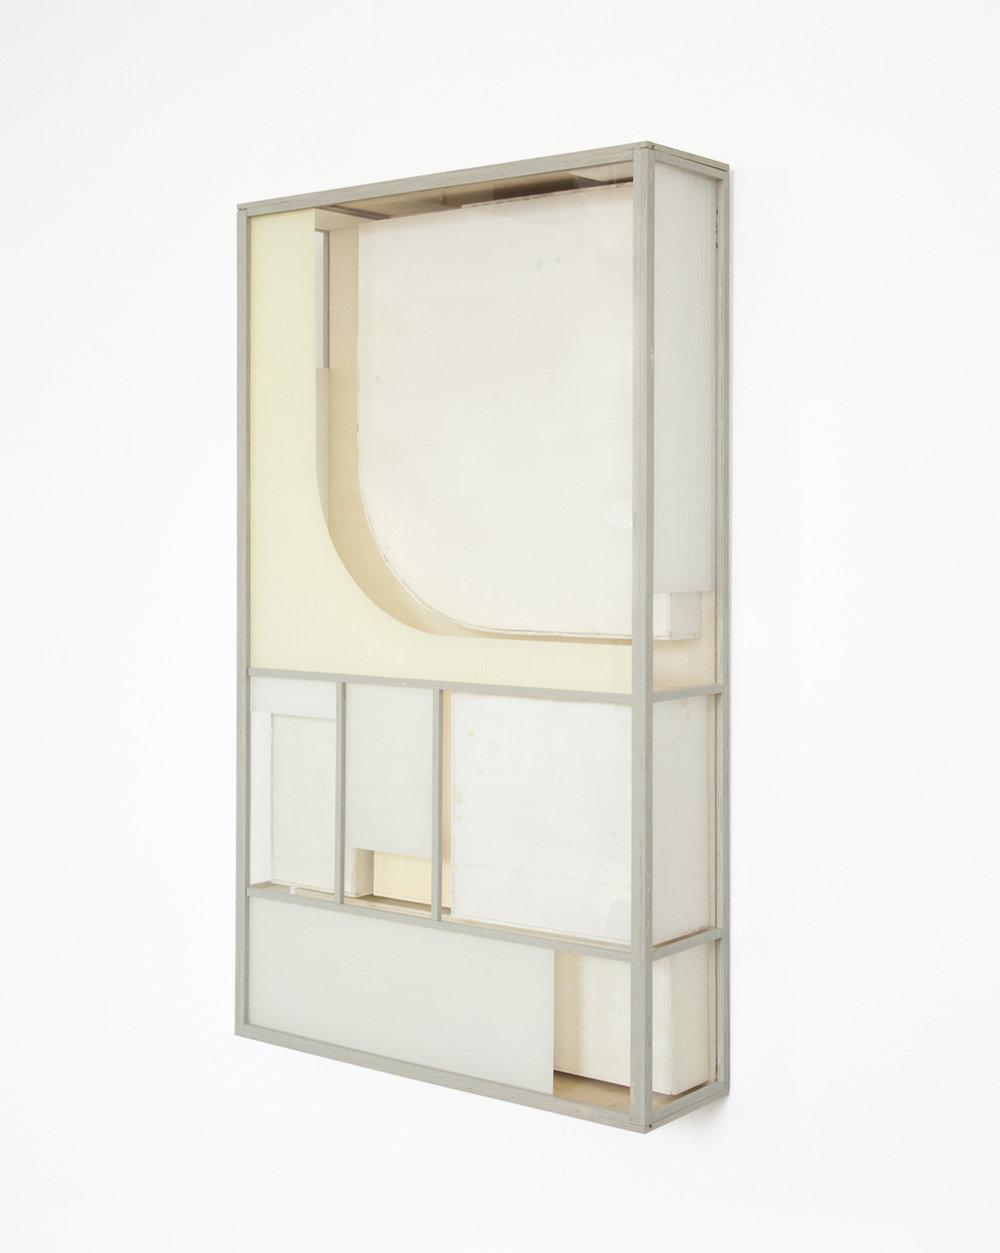 Minimal FM 2, 2018, Holz, Acrylglas, Farbe, 81 x 47 x 13 cm